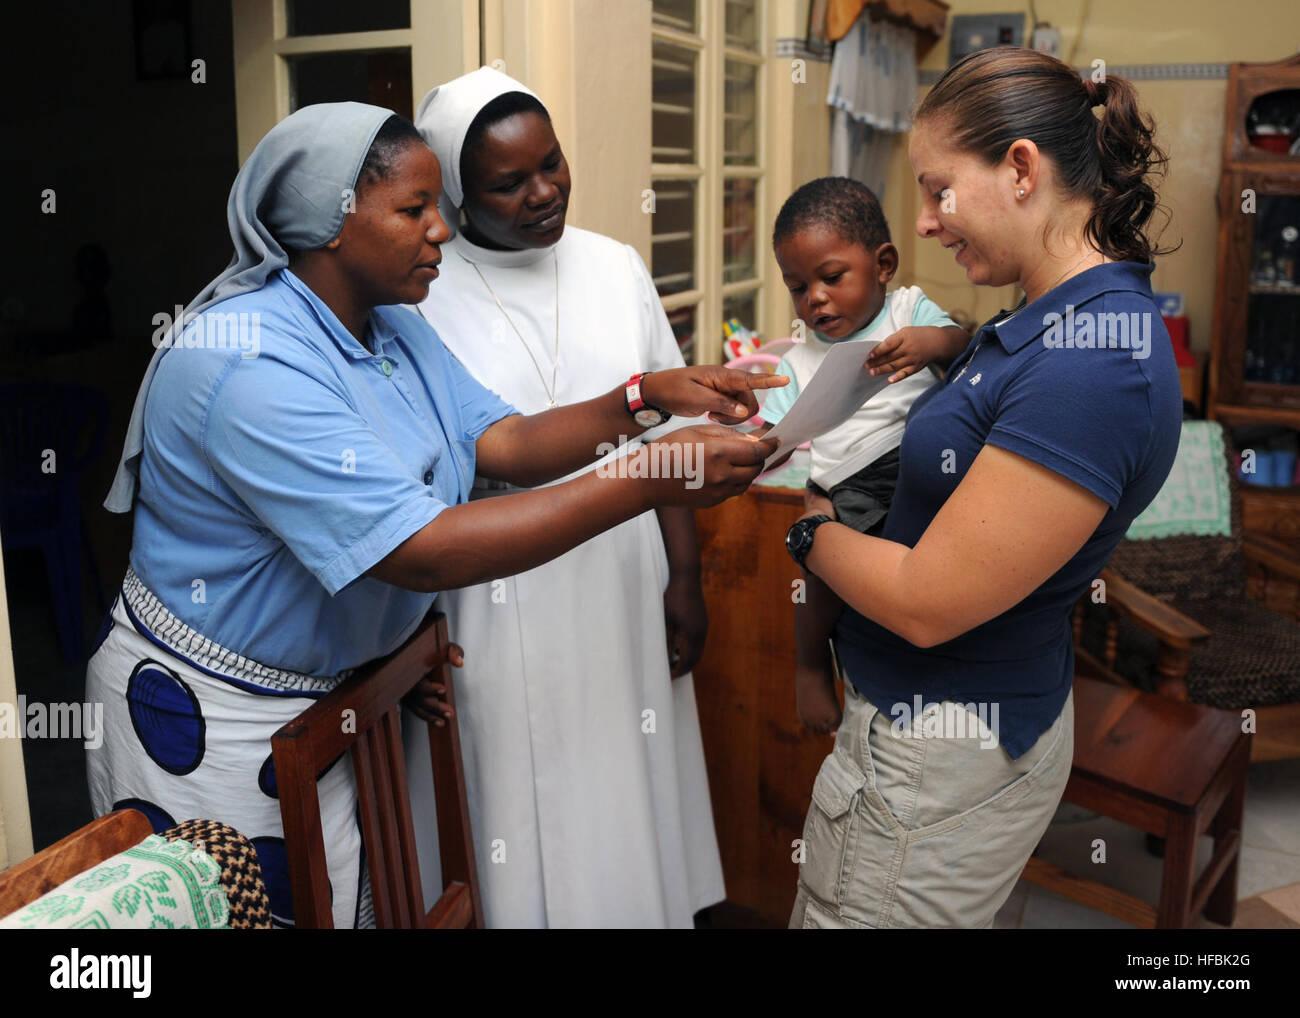 110216-N-6984M-001 TANGA, Tanzania (Feb. 16, 2011) Hospital Corpsman 2nd Class Cheryl Parker shows photographs of Stock Photo